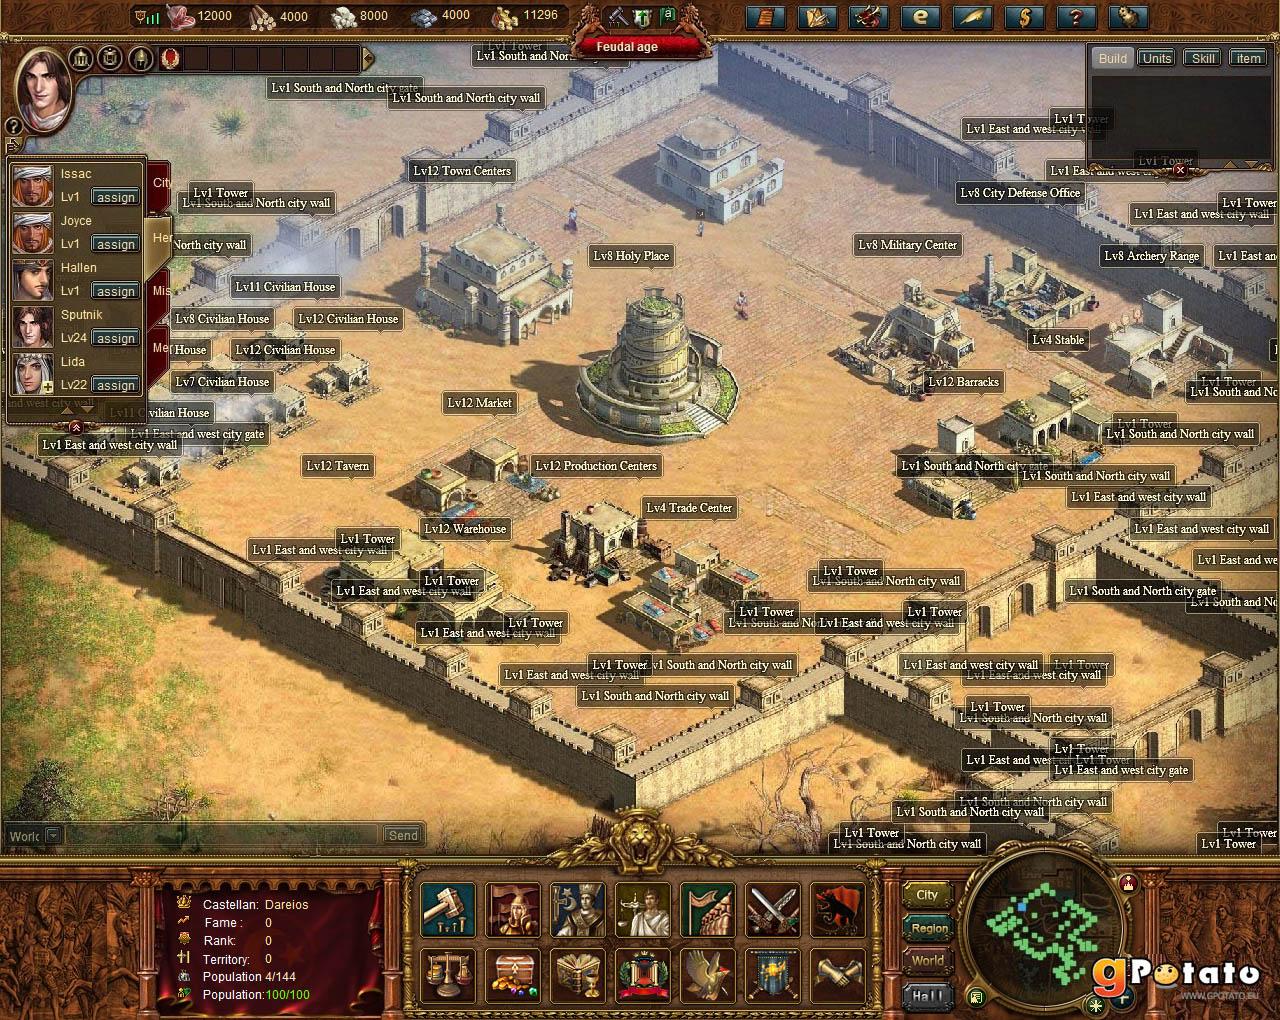 Click image for larger version.Name:Terra Militaris 1.jpgViews:86Size:458.2 KBID:383